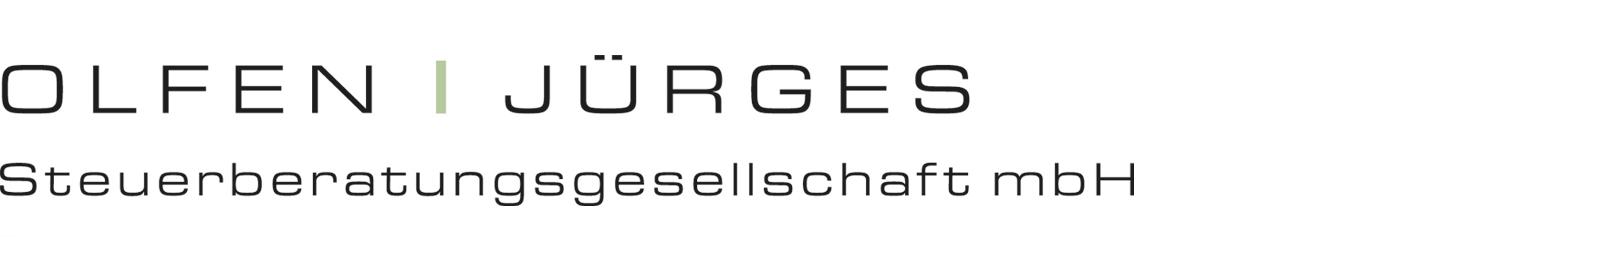 Olfen I Jürges Steuerberatungs-GmbH